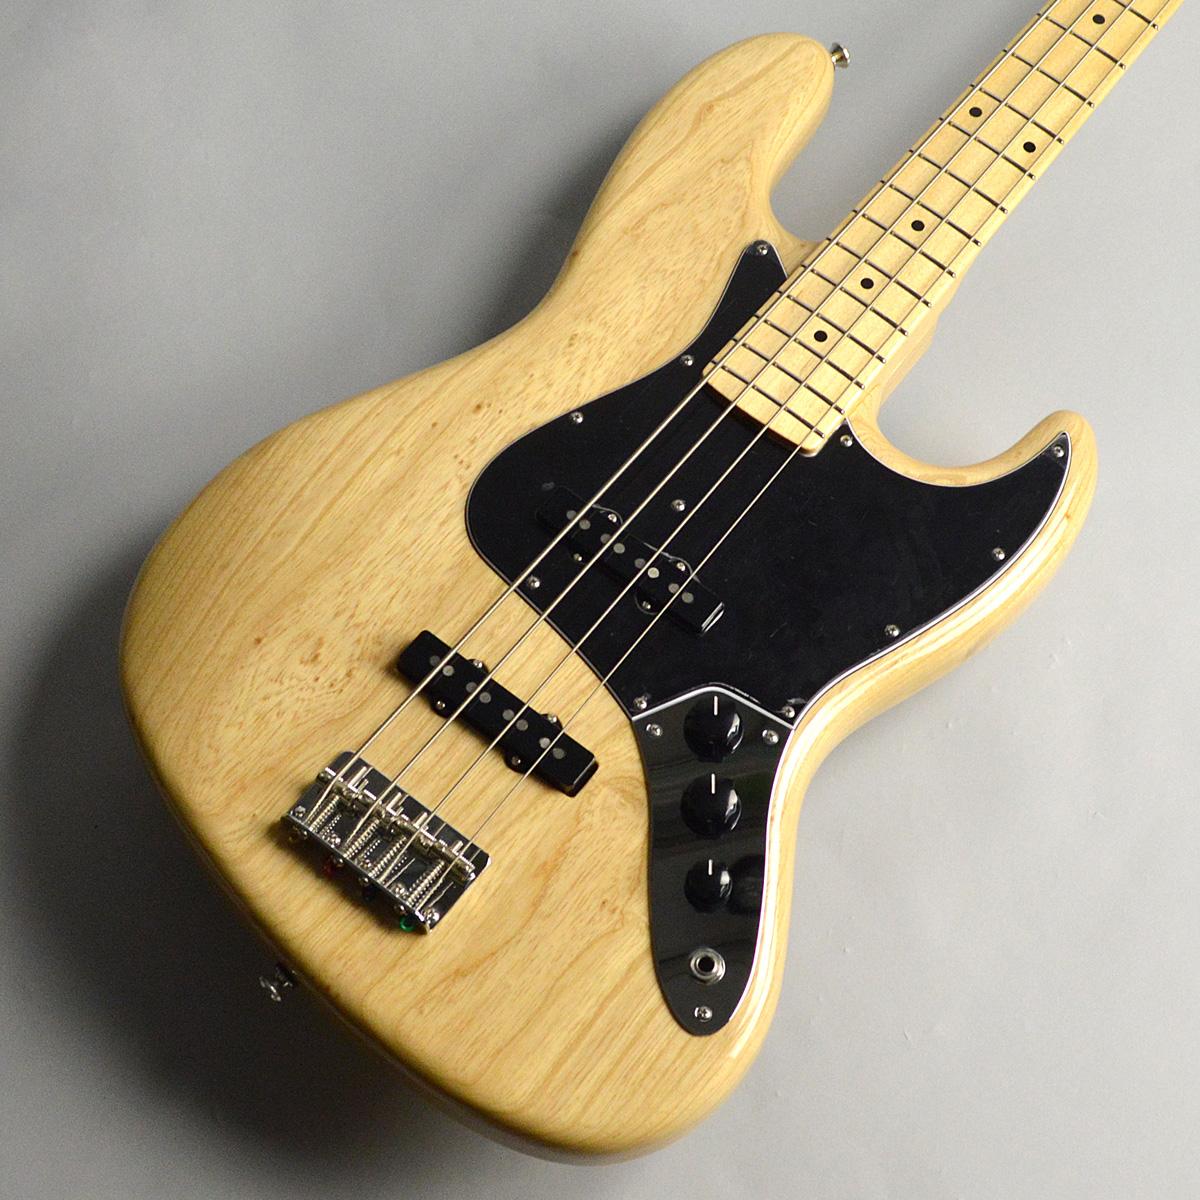 RSJB / Retro Spective Jazz Bassのボディトップ-アップ画像